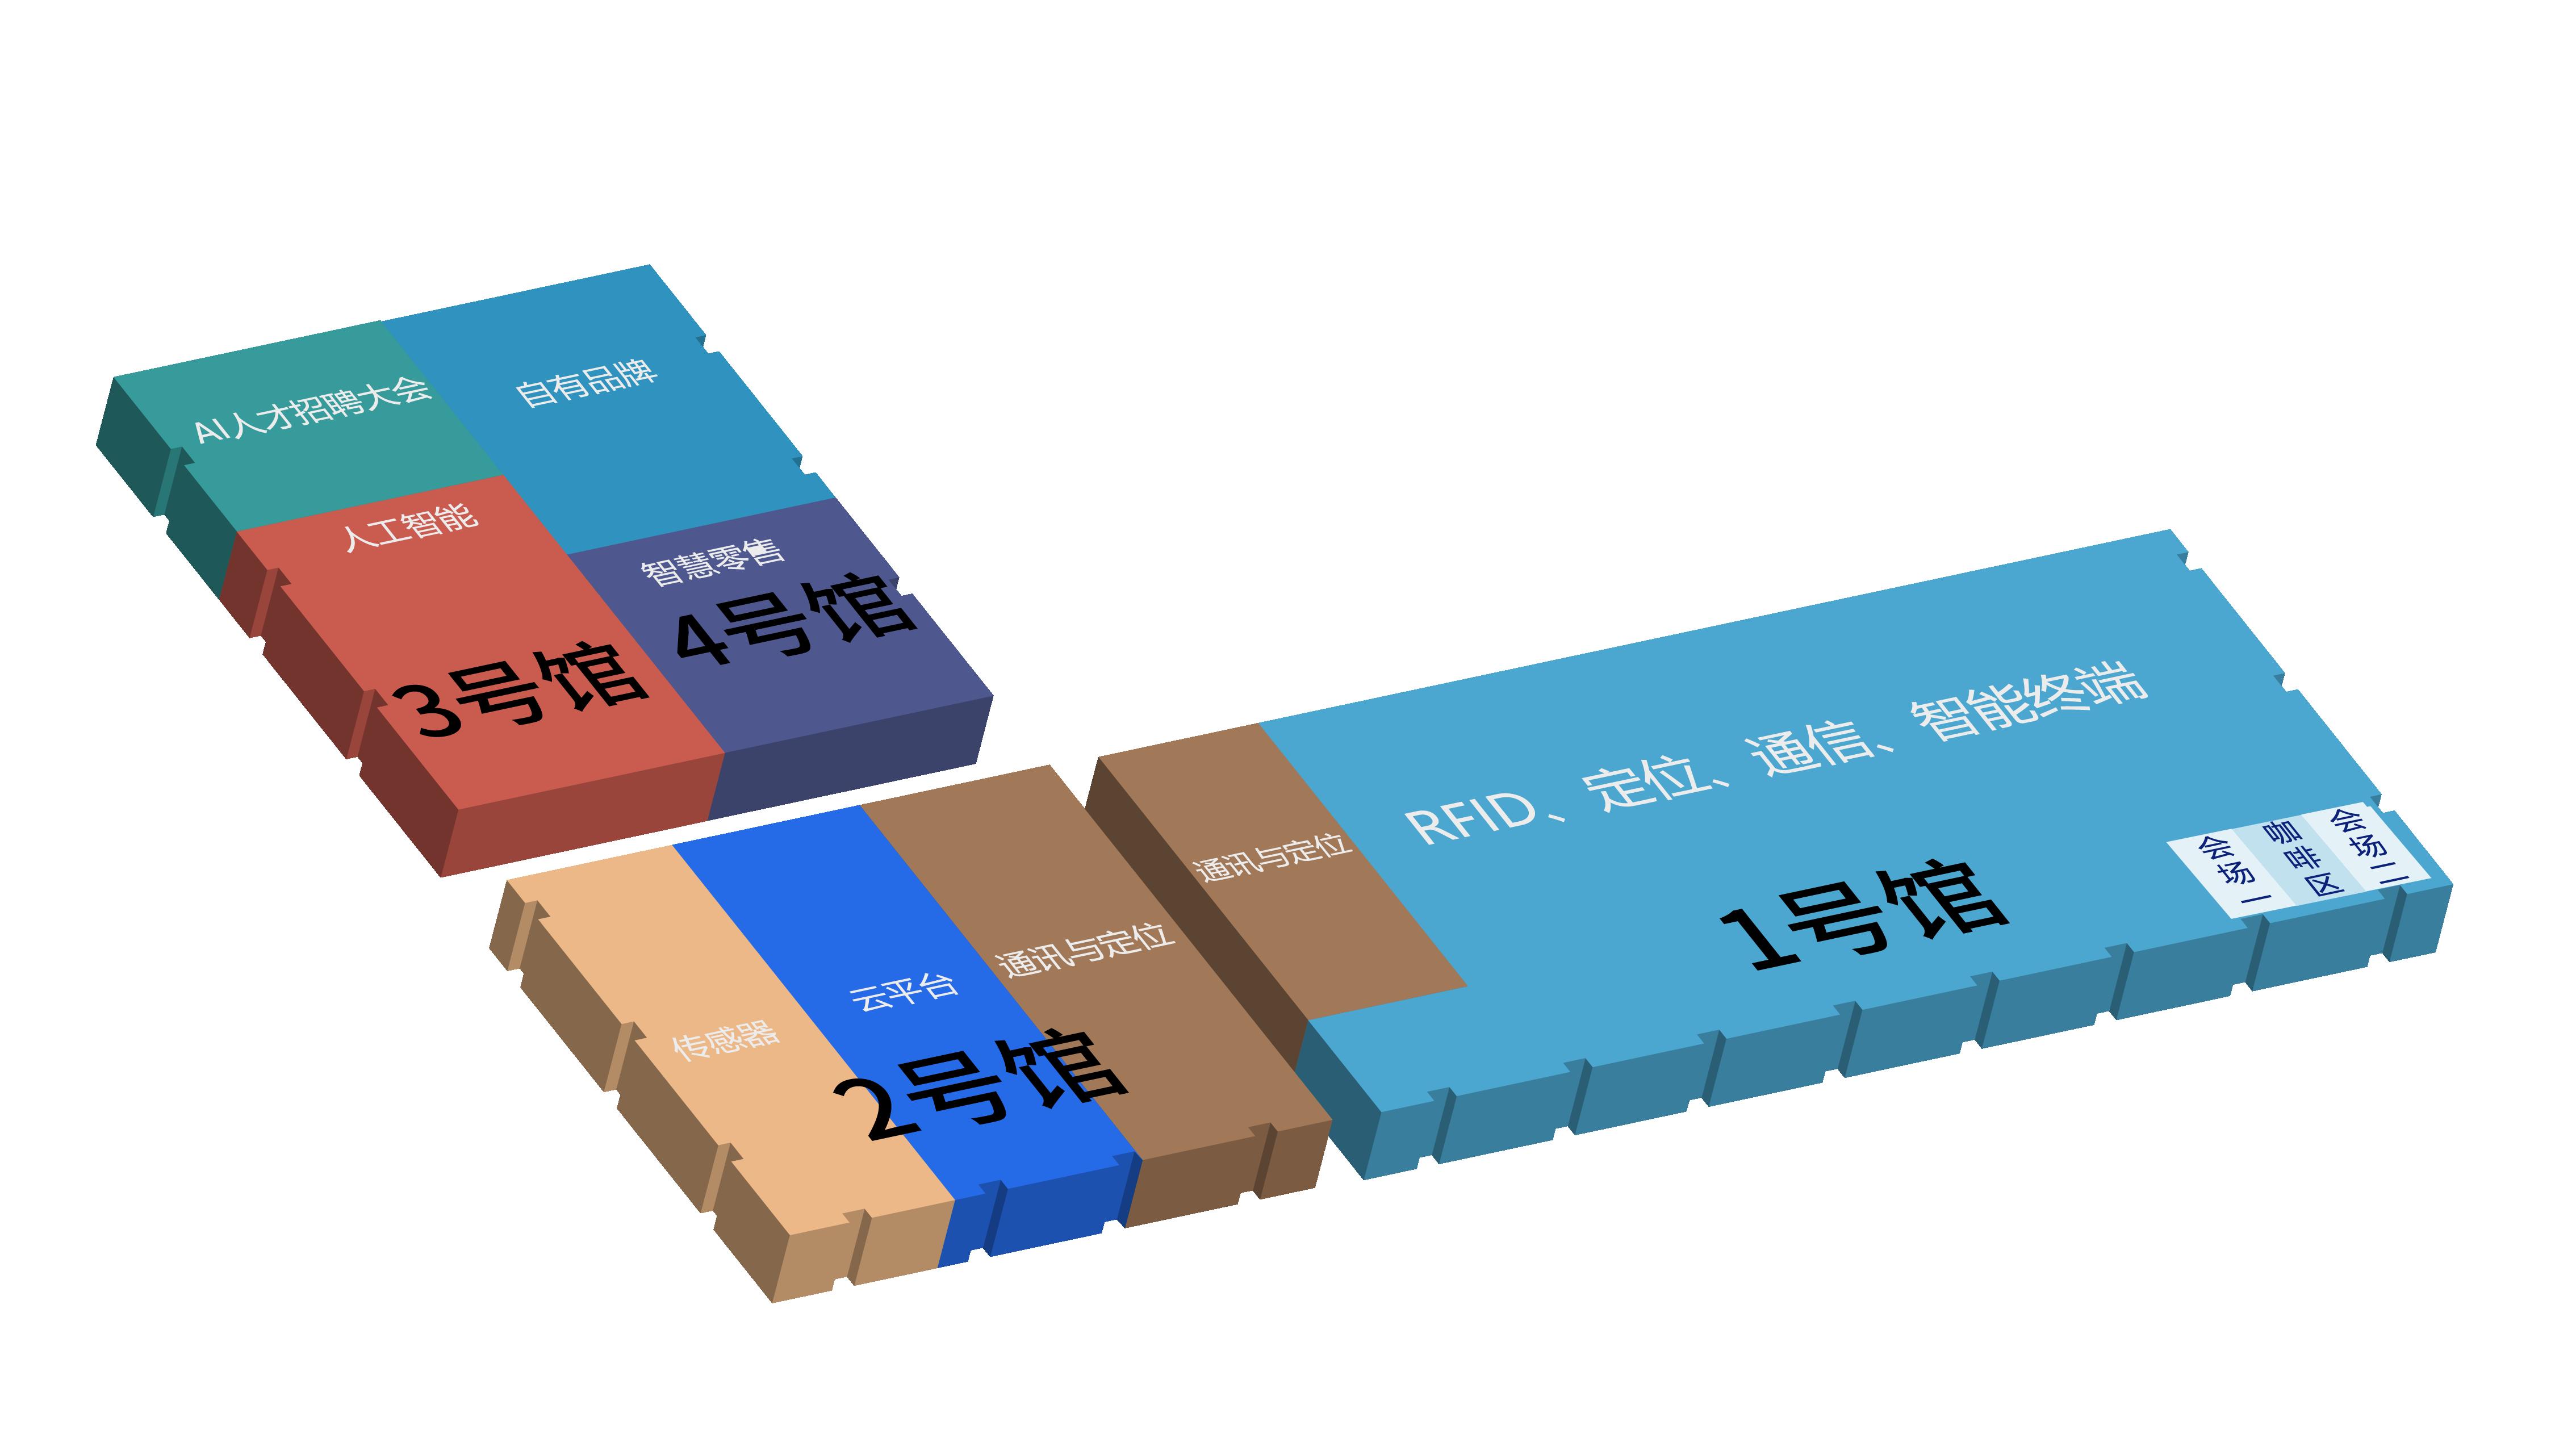 展会导览图-02.png